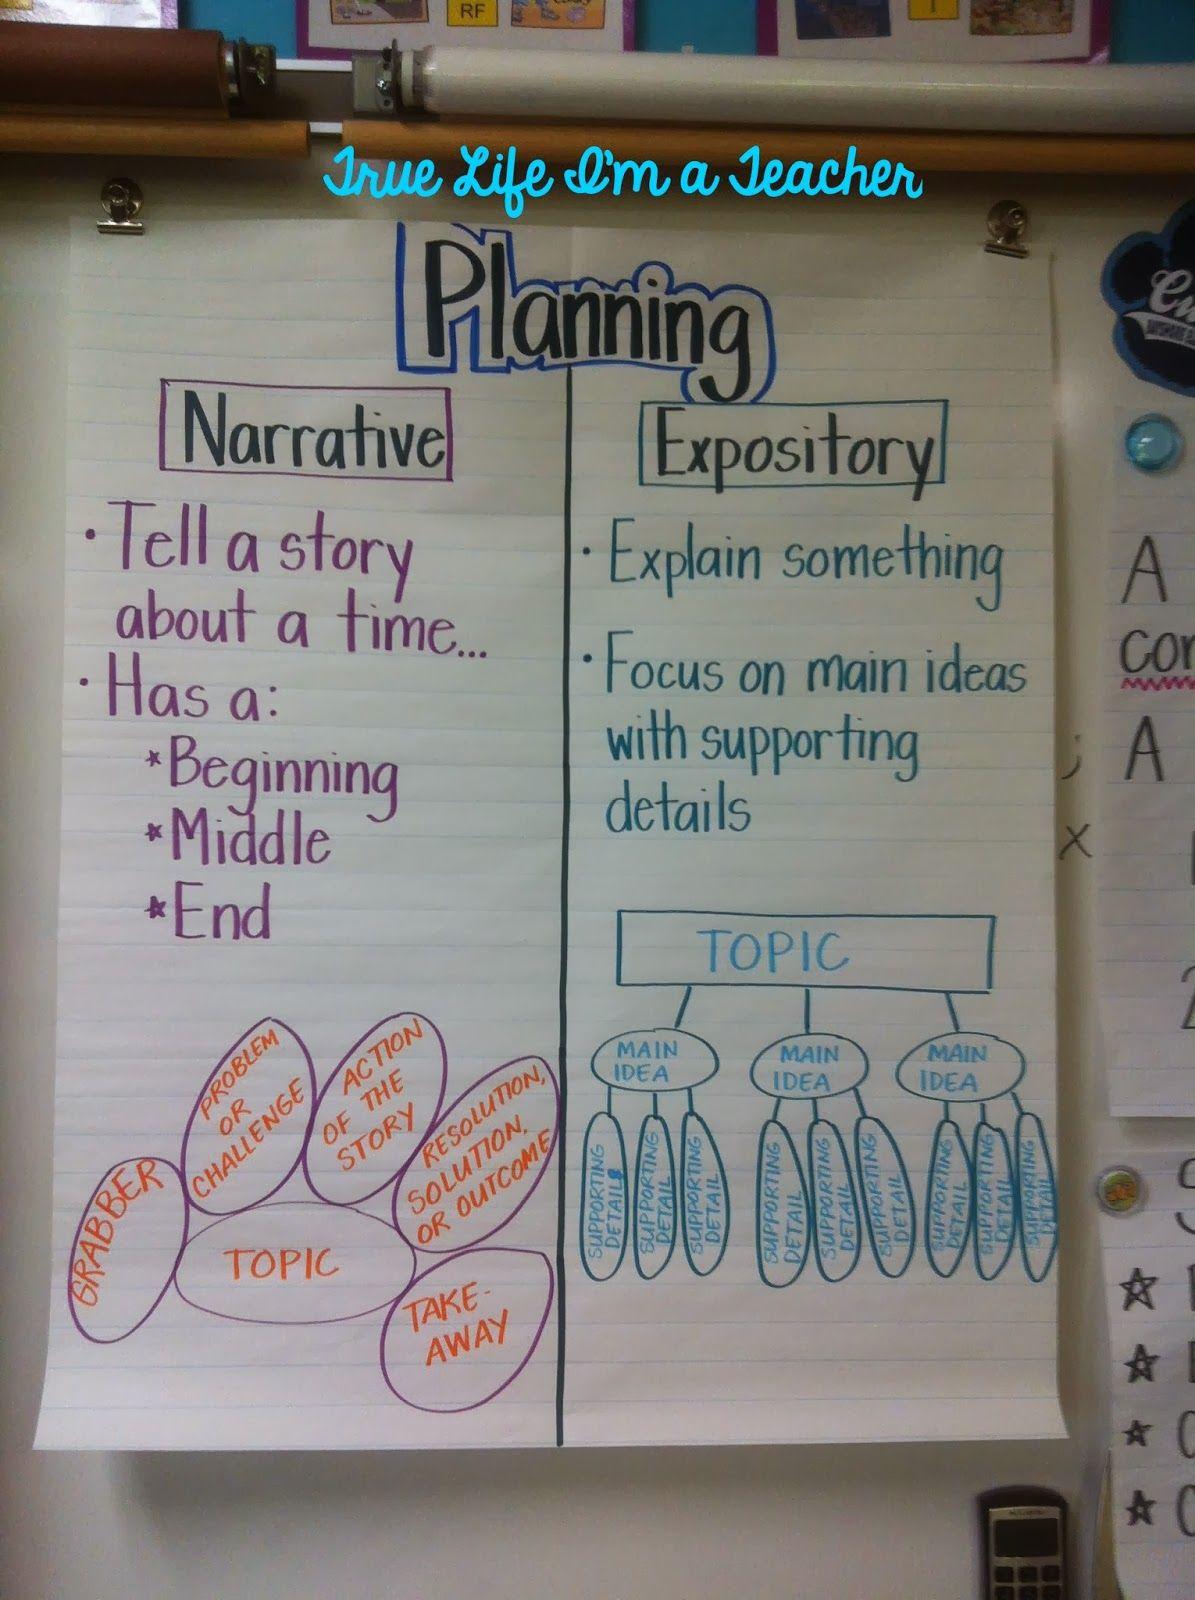 Expository vs. narrative essay